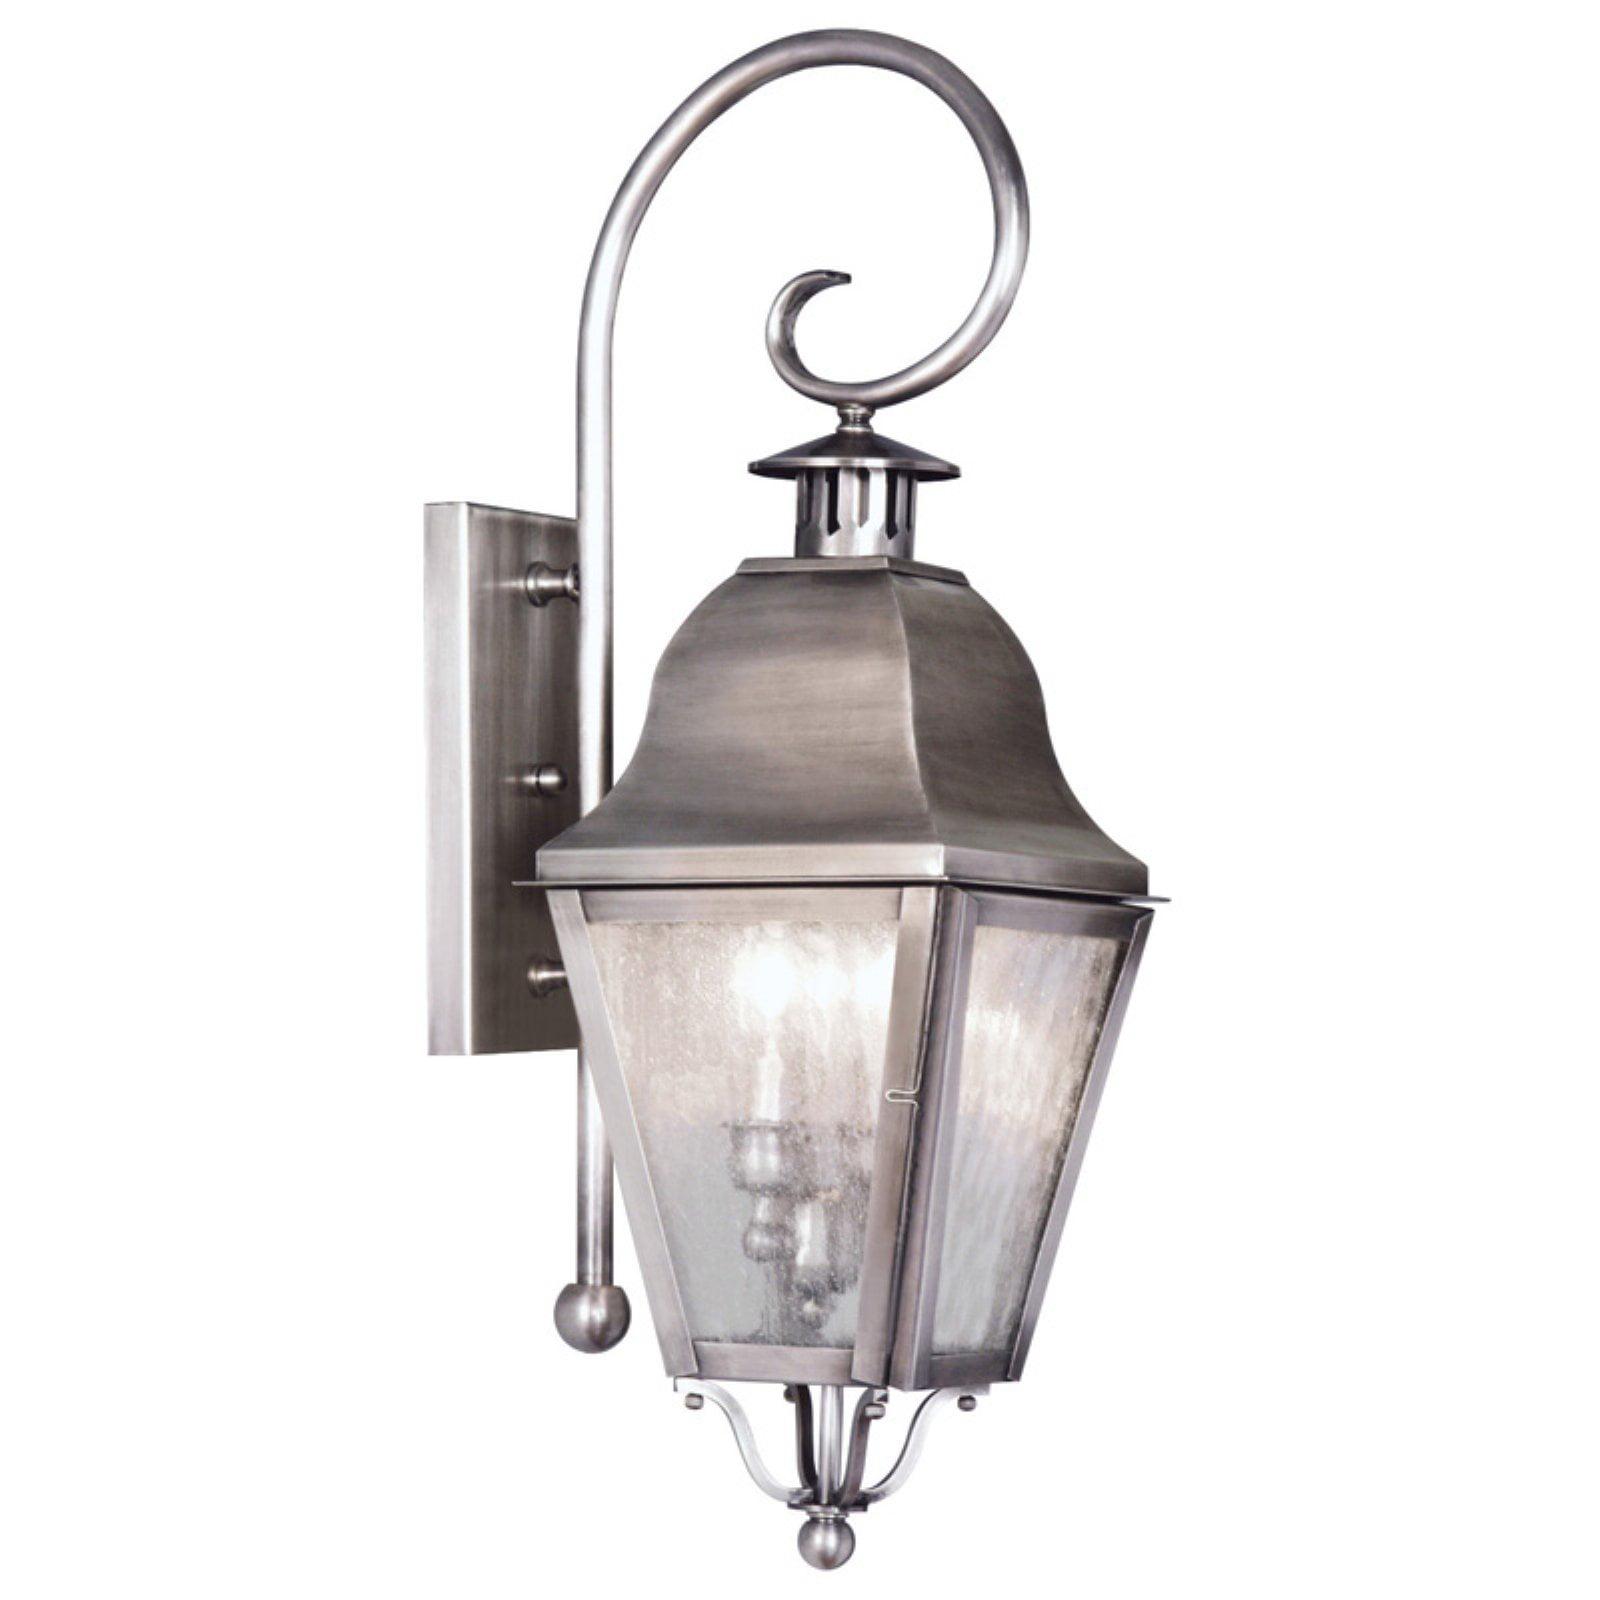 Livex Lighting Amwell 2 Light Outdoor Wall Lantern